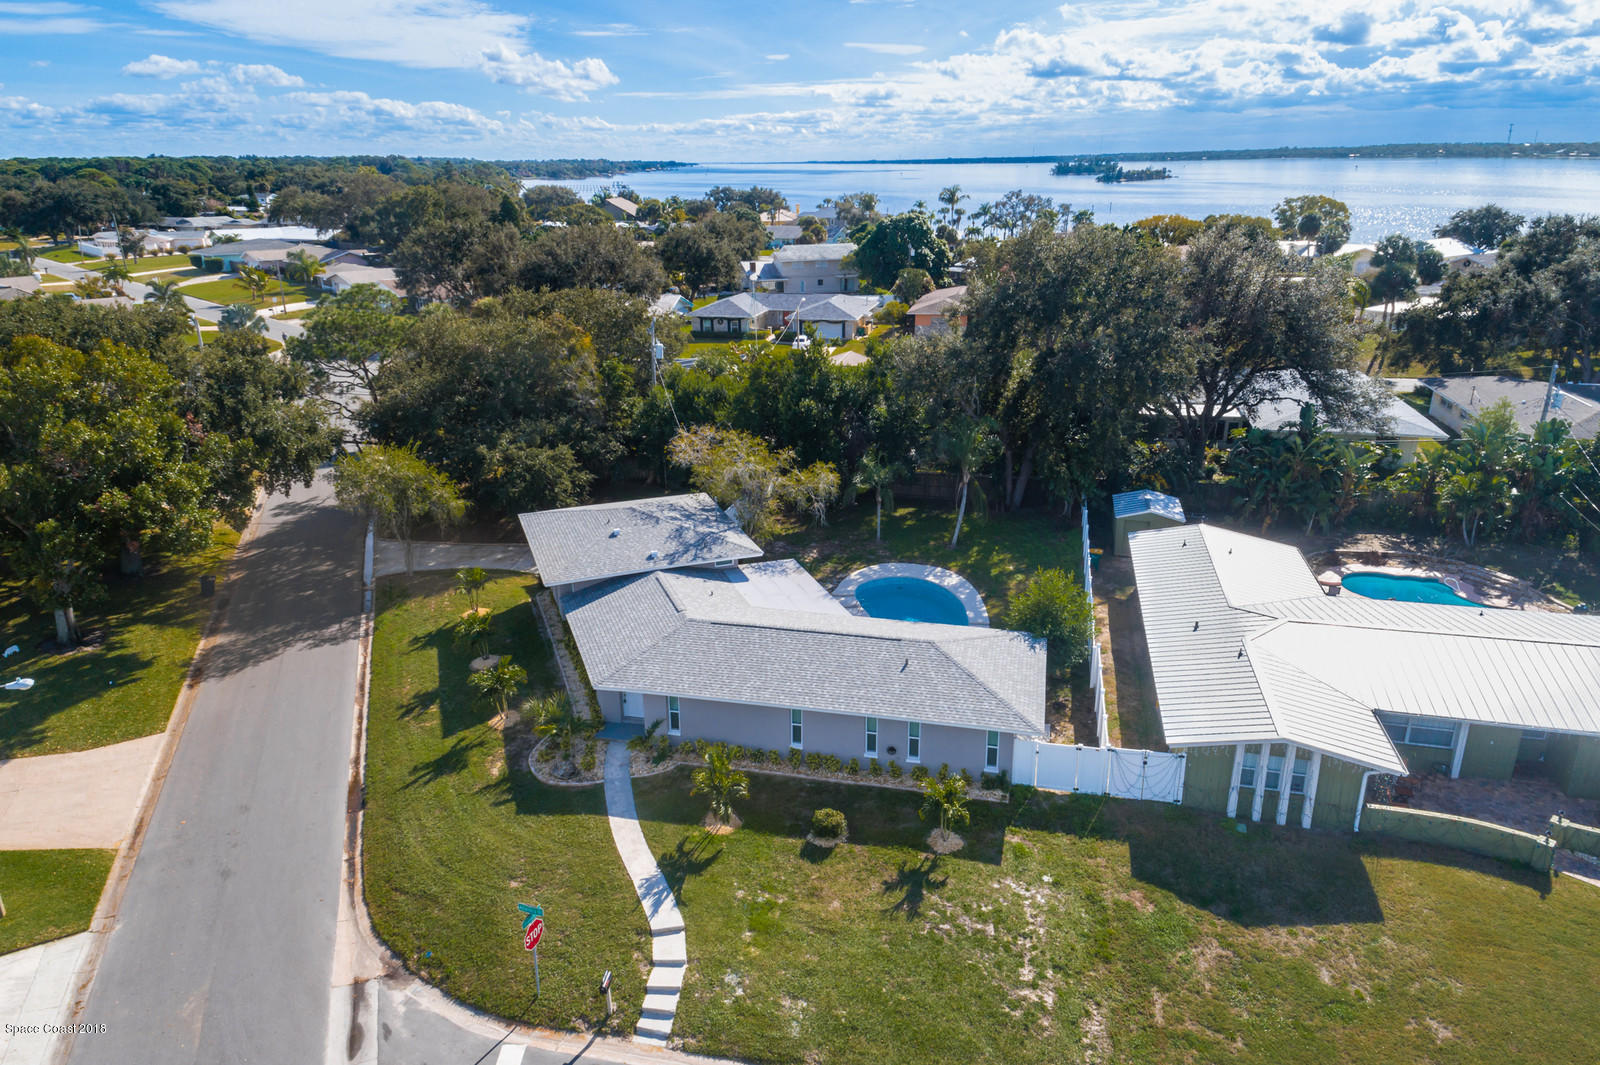 Single Family Home for Sale at 95 Alhambra 95 Alhambra Merritt Island, Florida 32952 United States